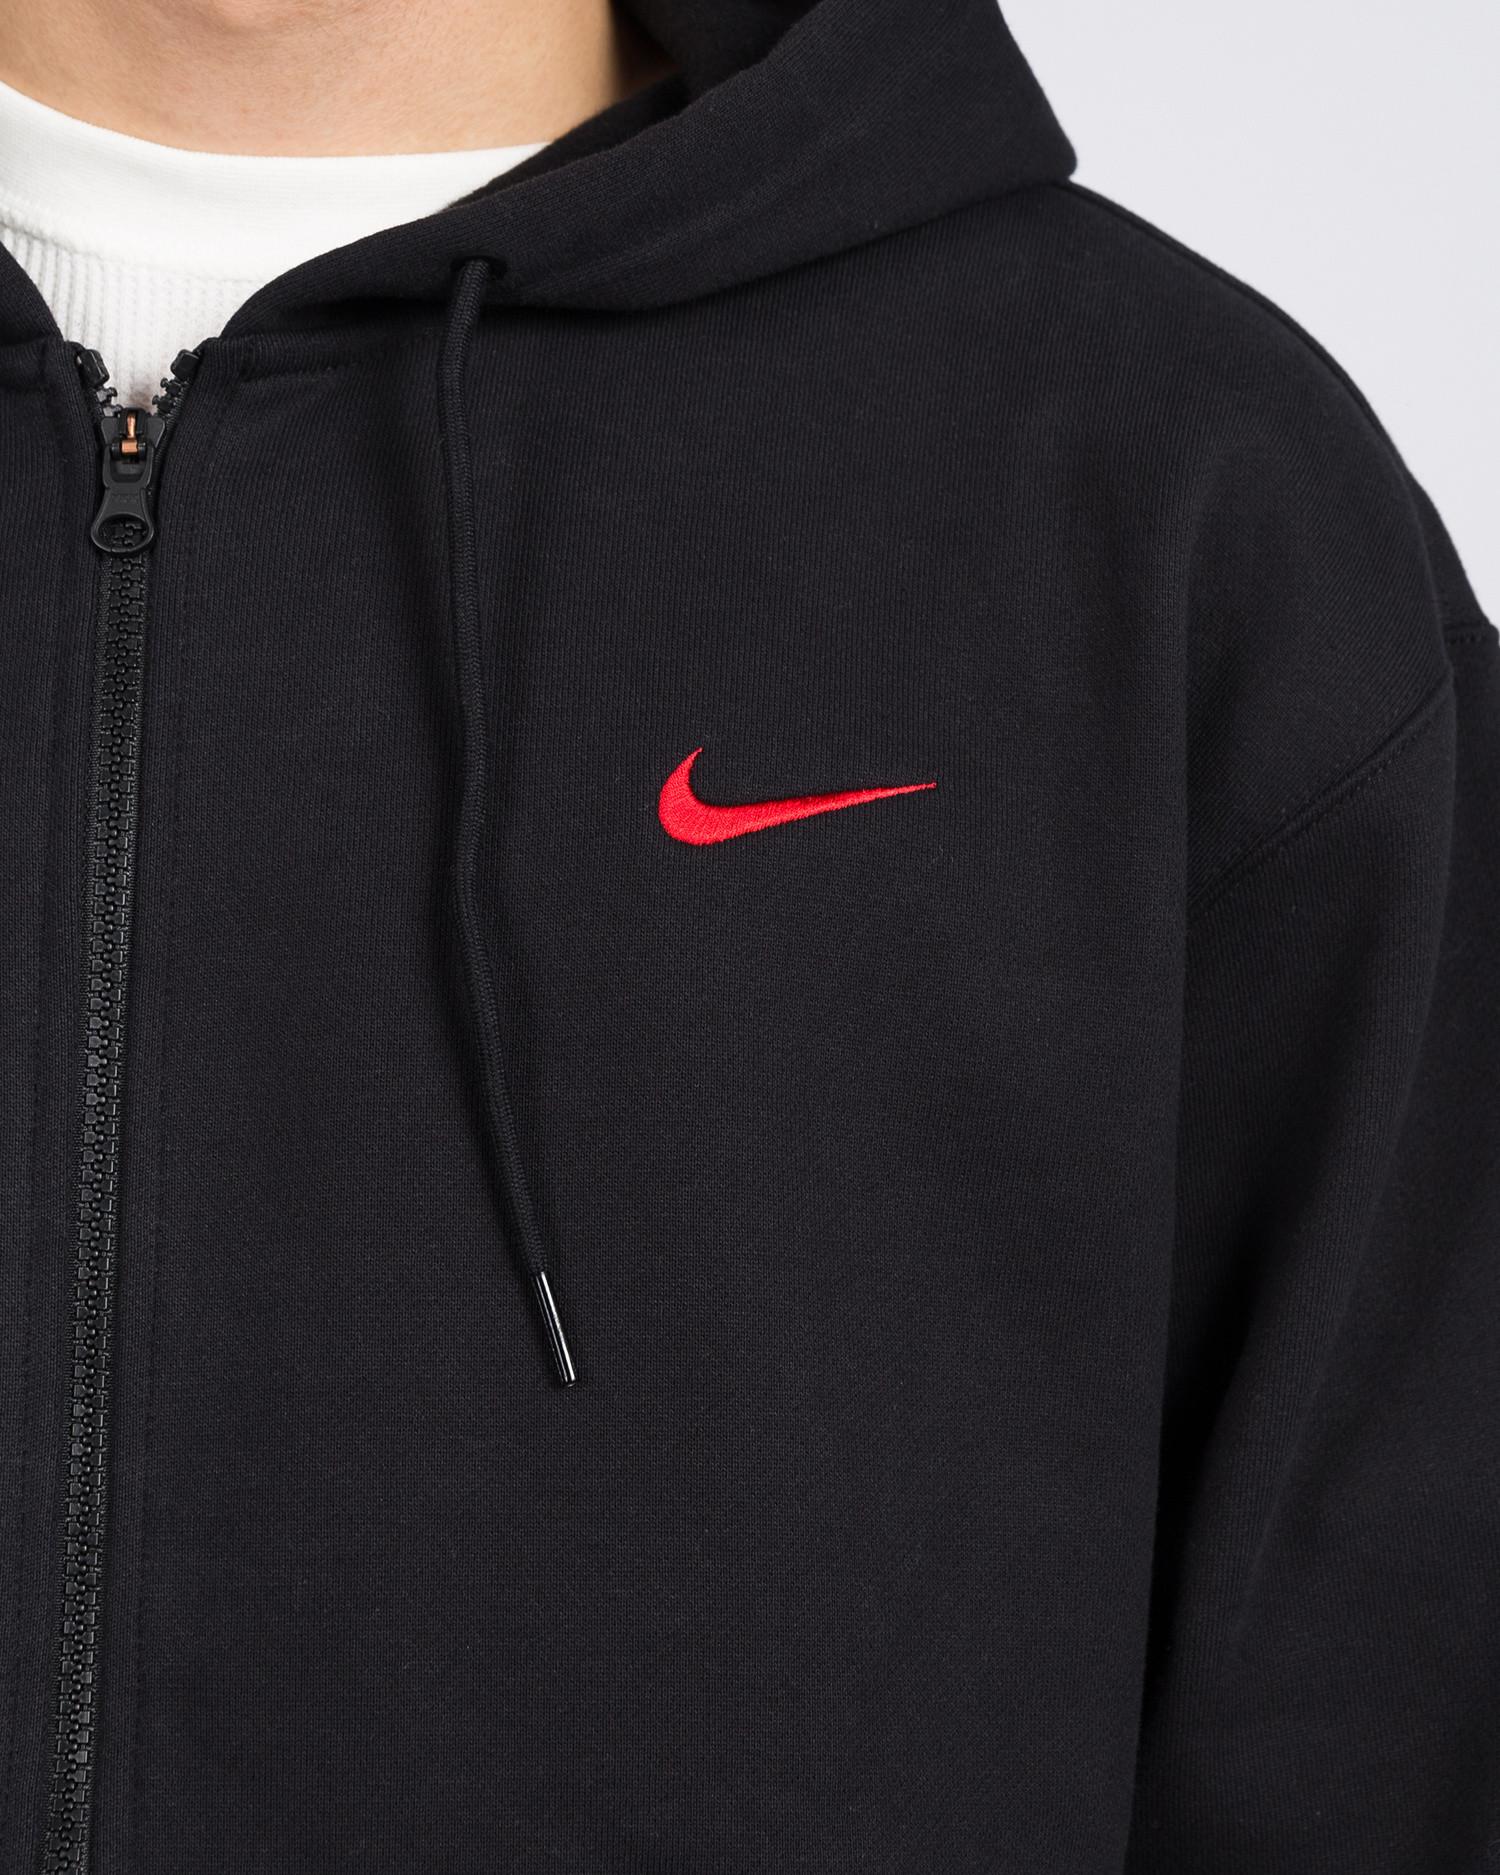 Nike SB ISO Oski Hood Black University Red